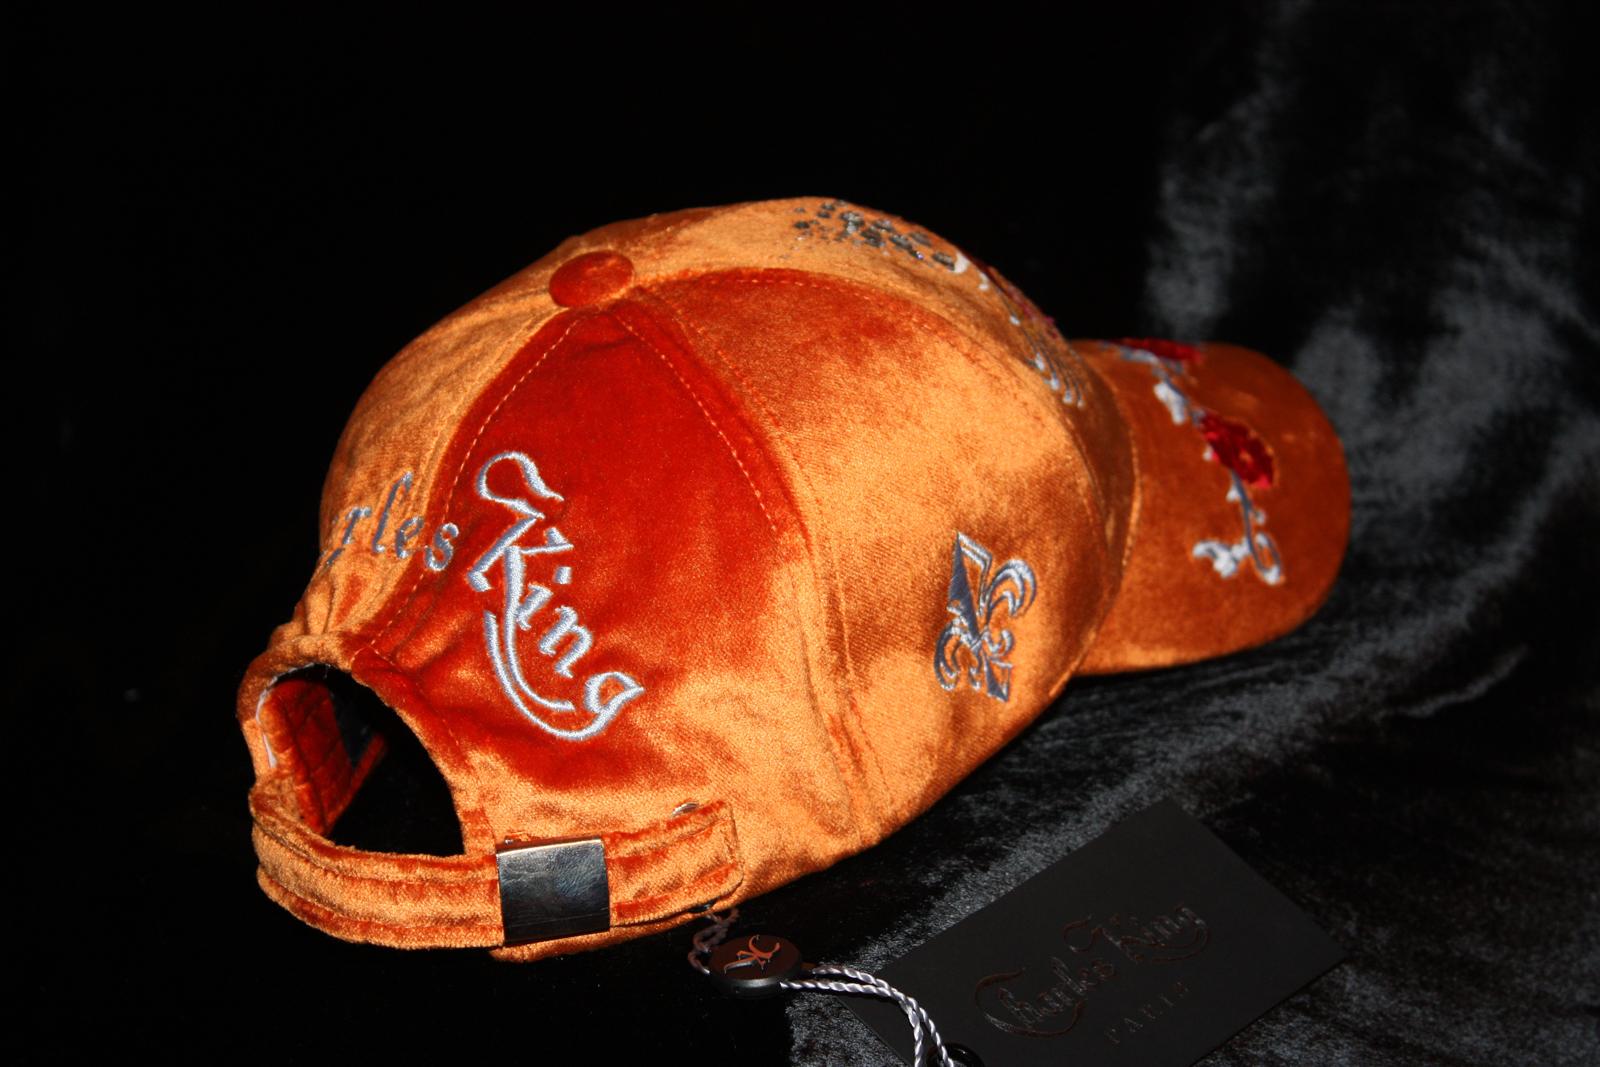 ... Love Heart Silk Velvet Orange Women Hat Fashion Baseball Cap Glam Rock  Clothing Urban Wear ... f8749d71b093